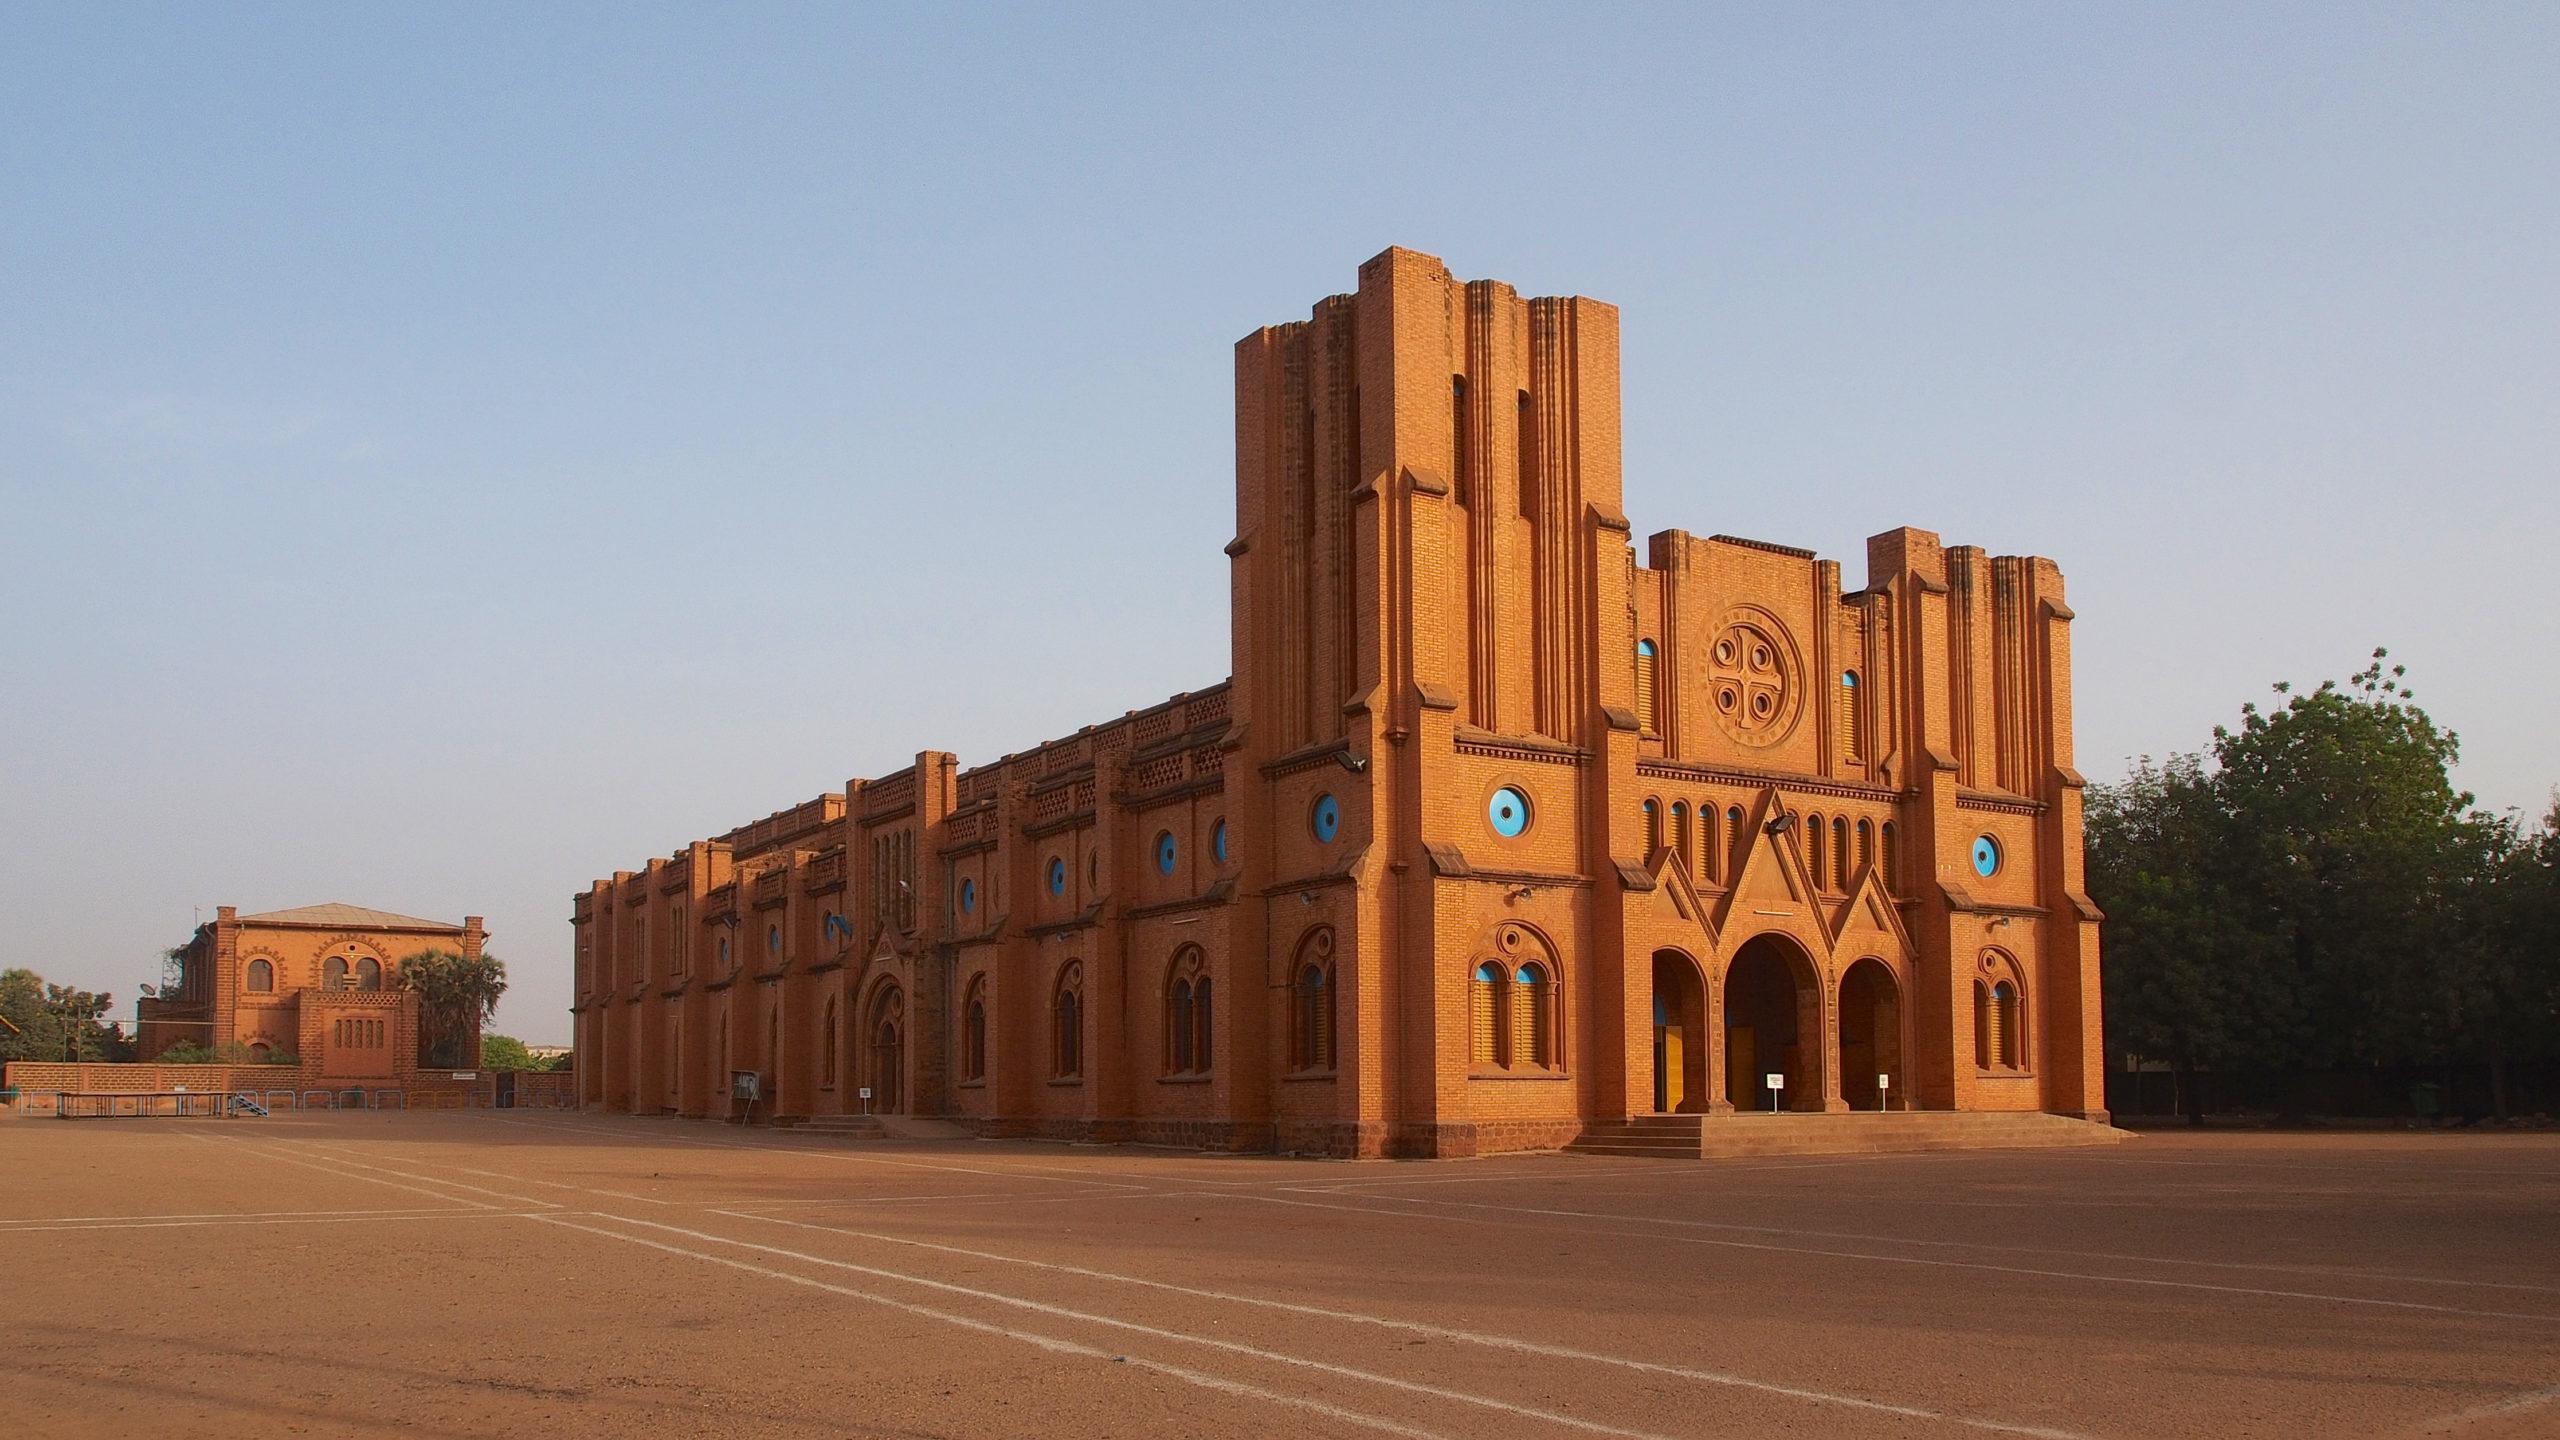 Cathédrale de Ouagadougou (Burkina Faso) @ wikipedia commons / Sputniktilt